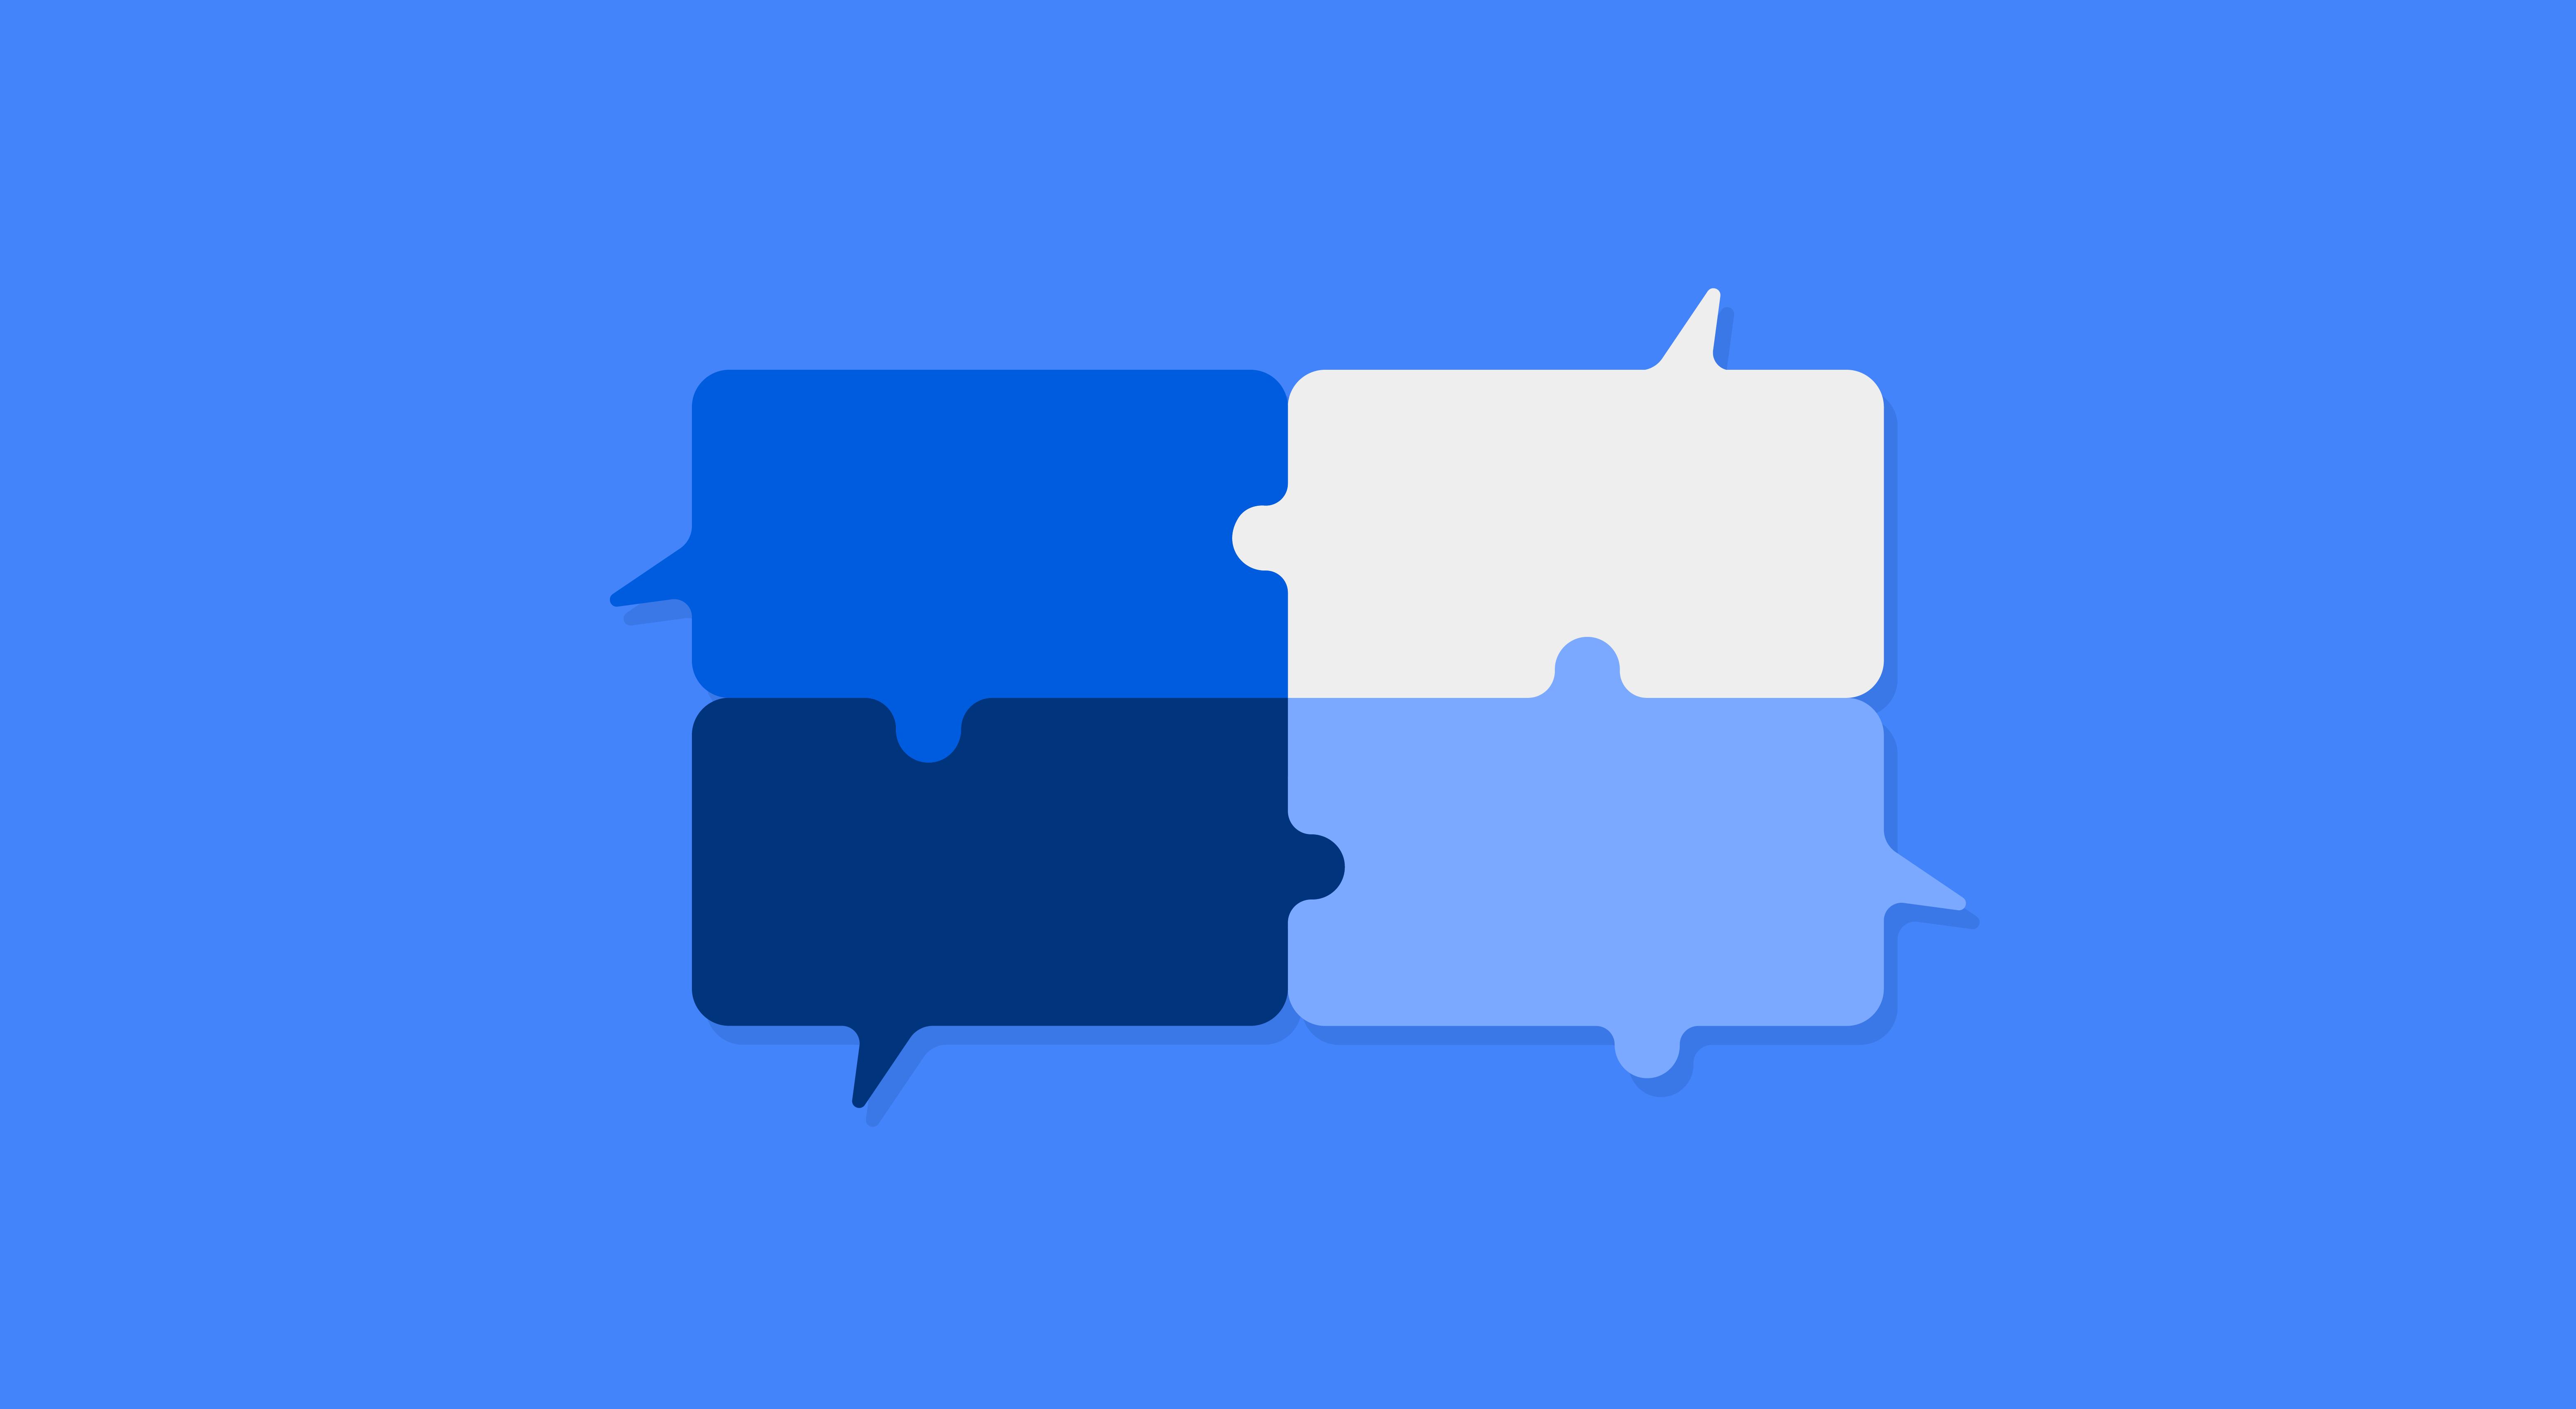 Chatbot Design: An Introduction to Conversation Design